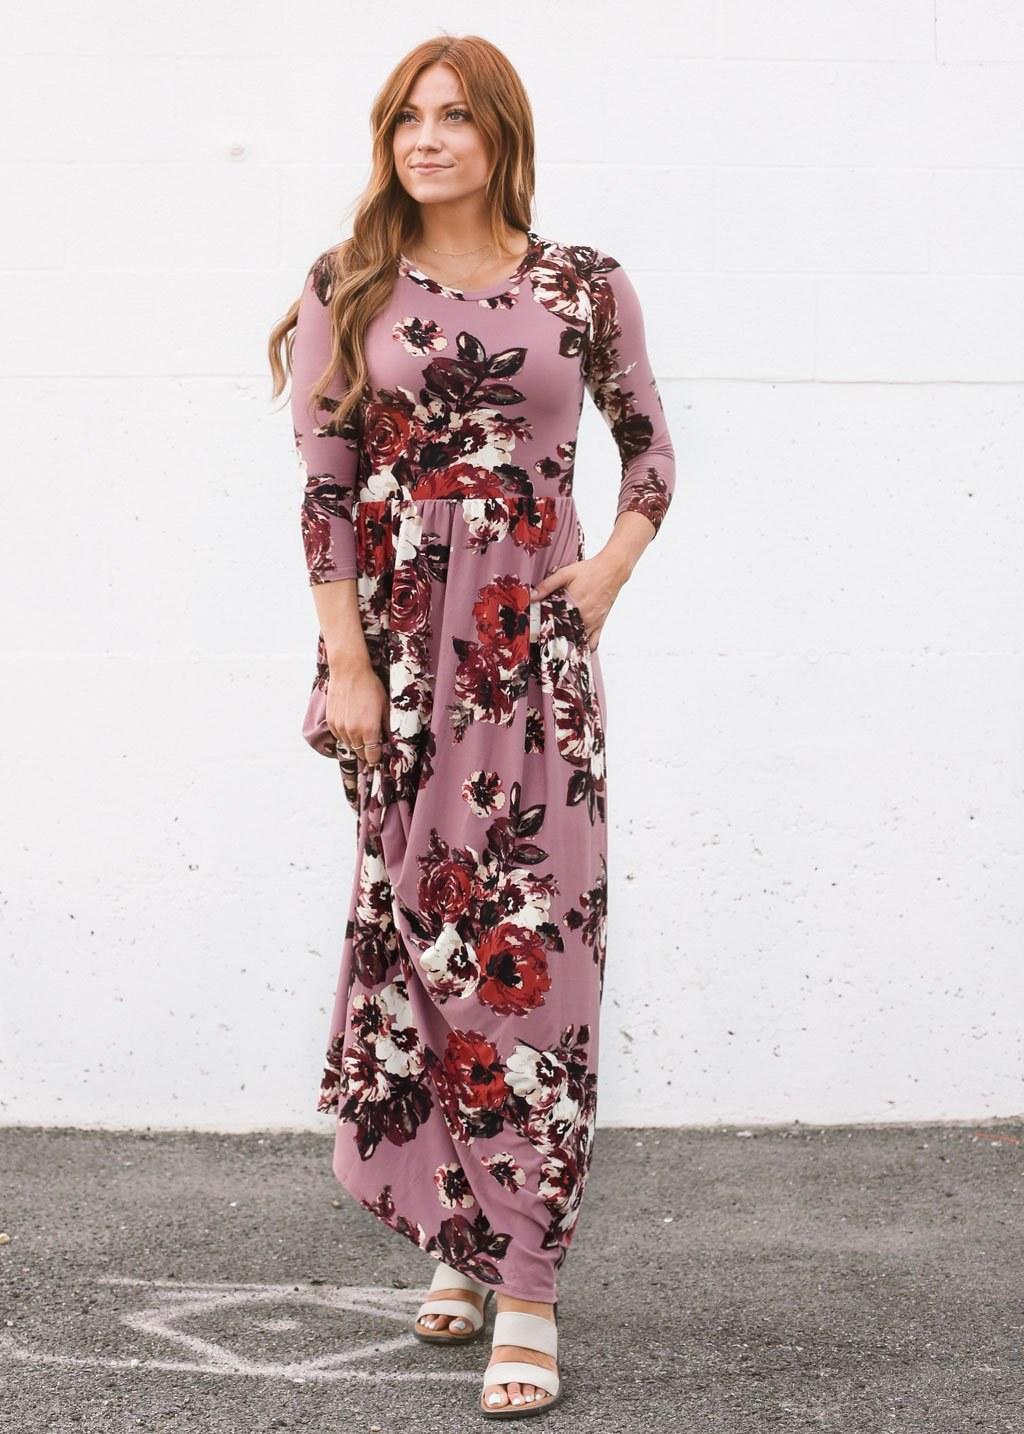 Inspirasi Desain Bridesmaid Hijab 9ddf Classic Rose Maxi Dress